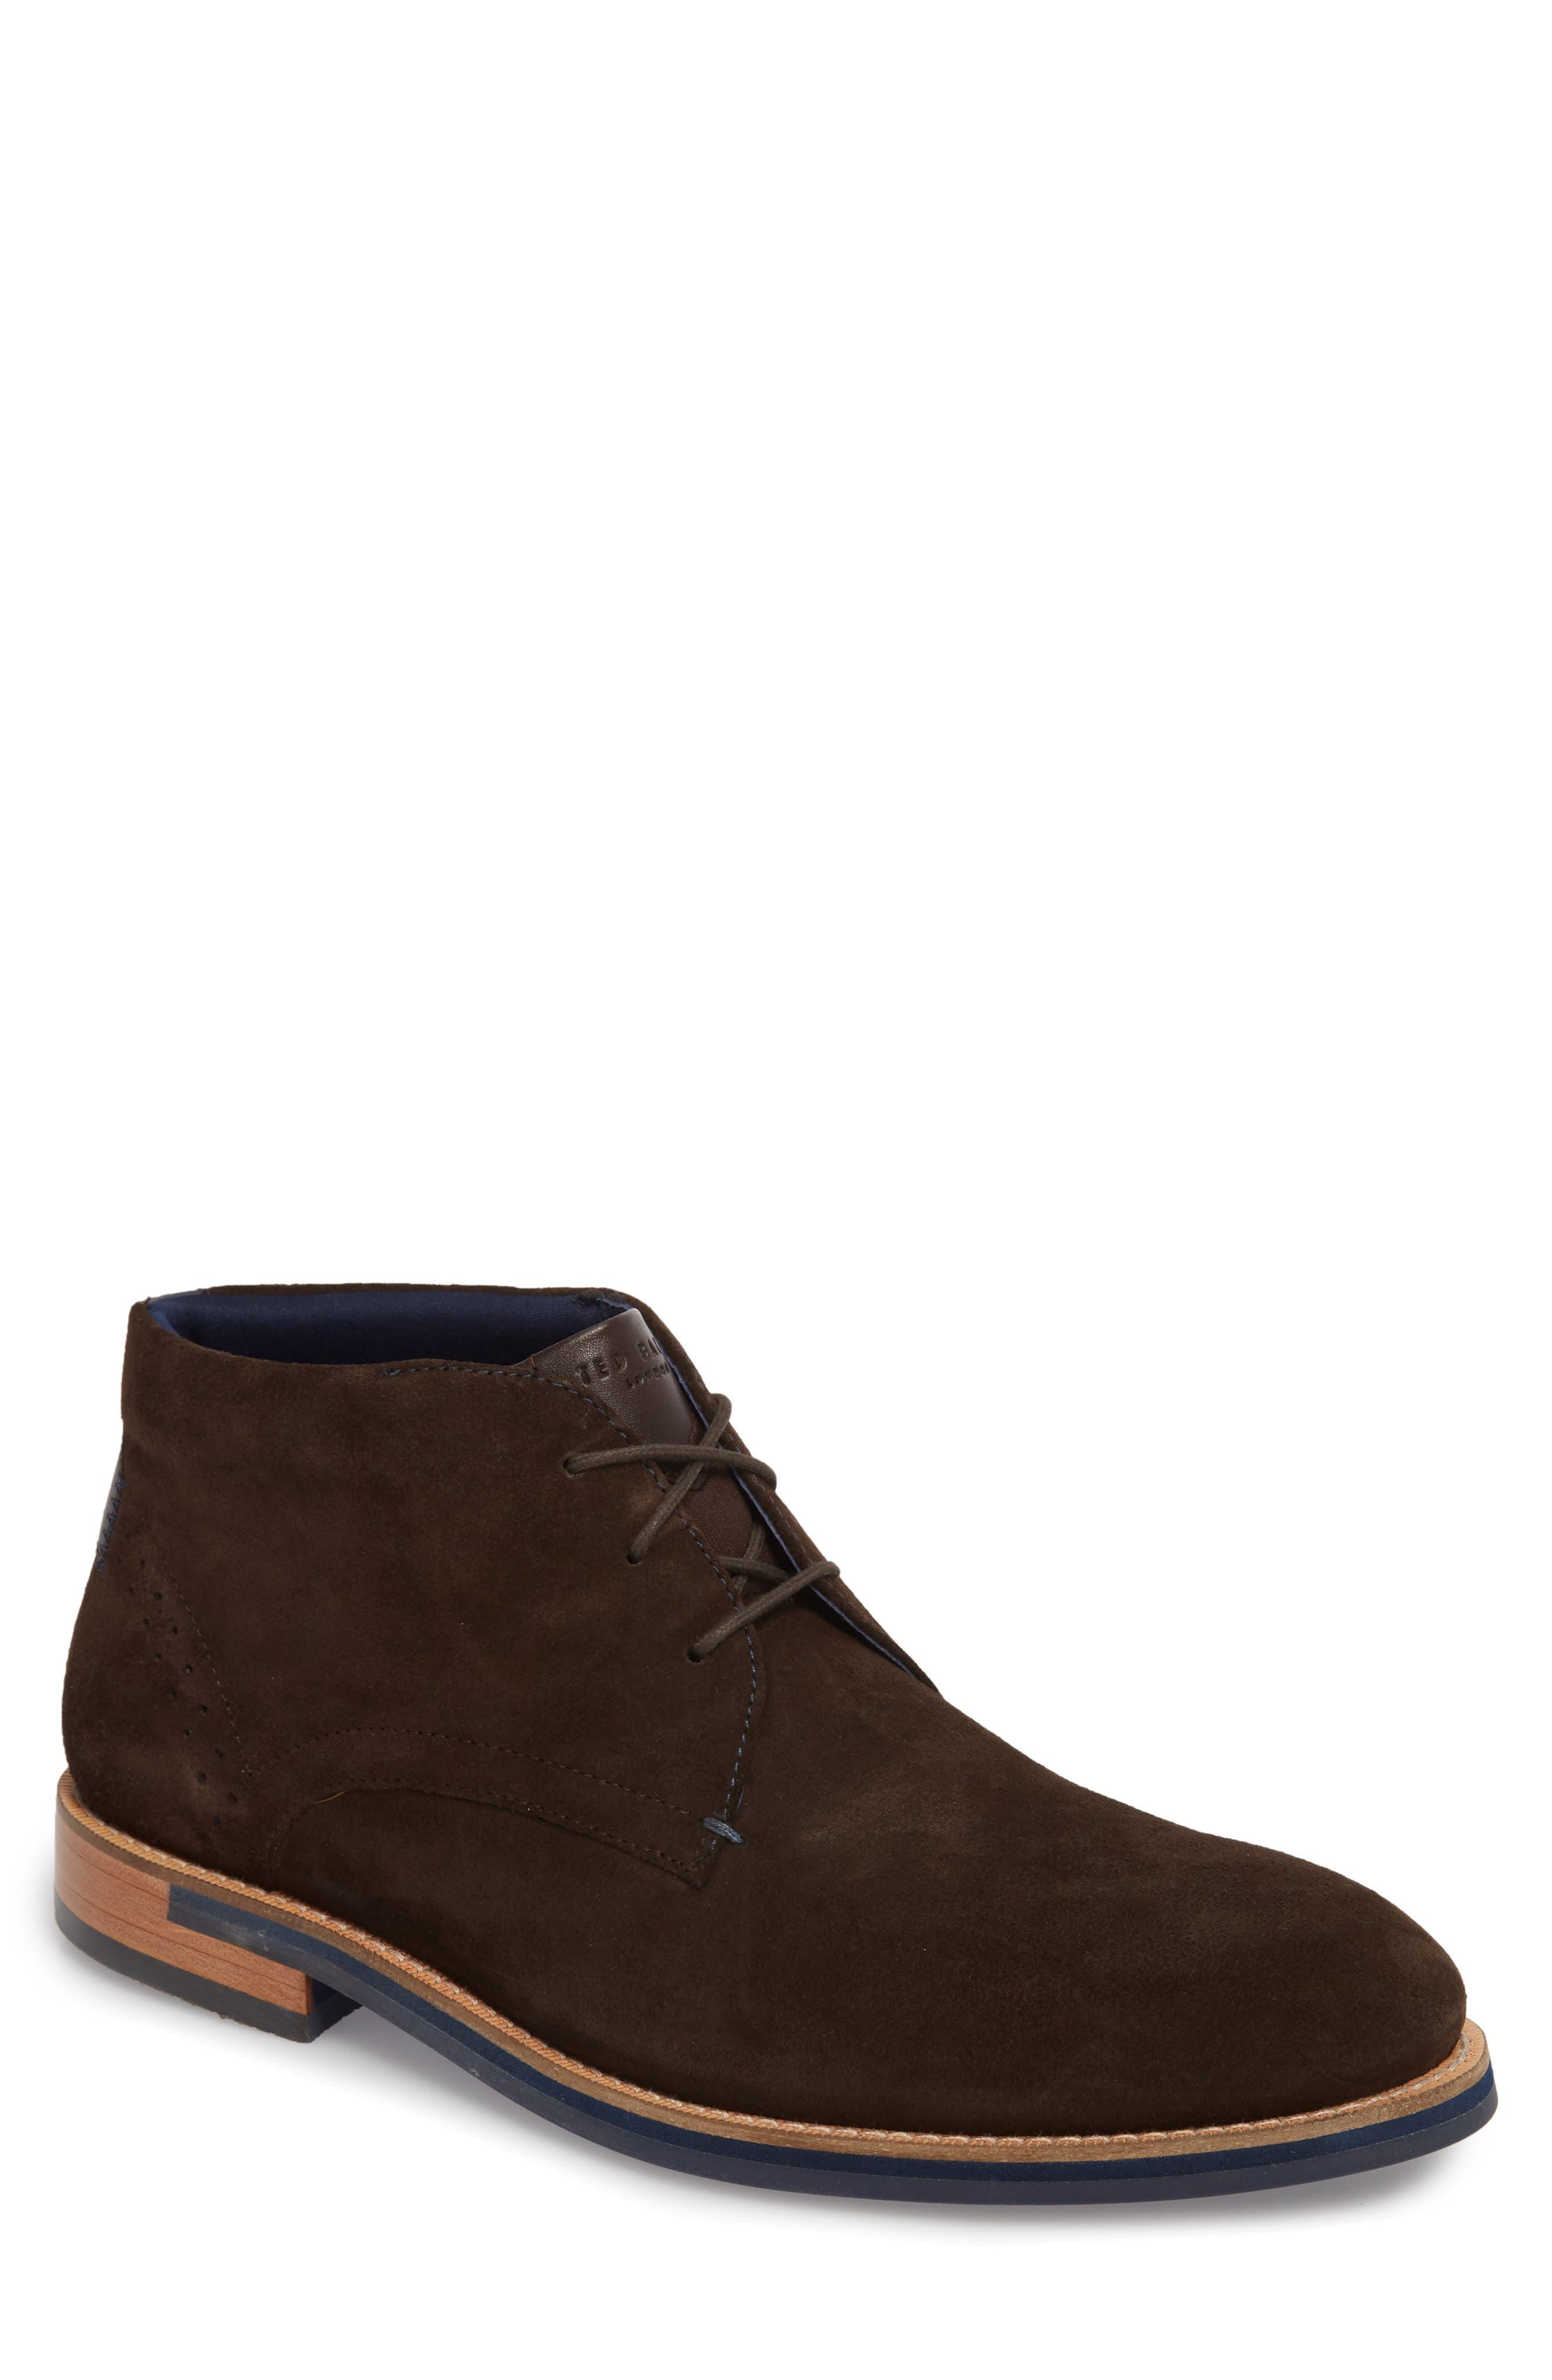 Daiinos Chukka Boot,                         Main,                         color, BROWN SUEDE